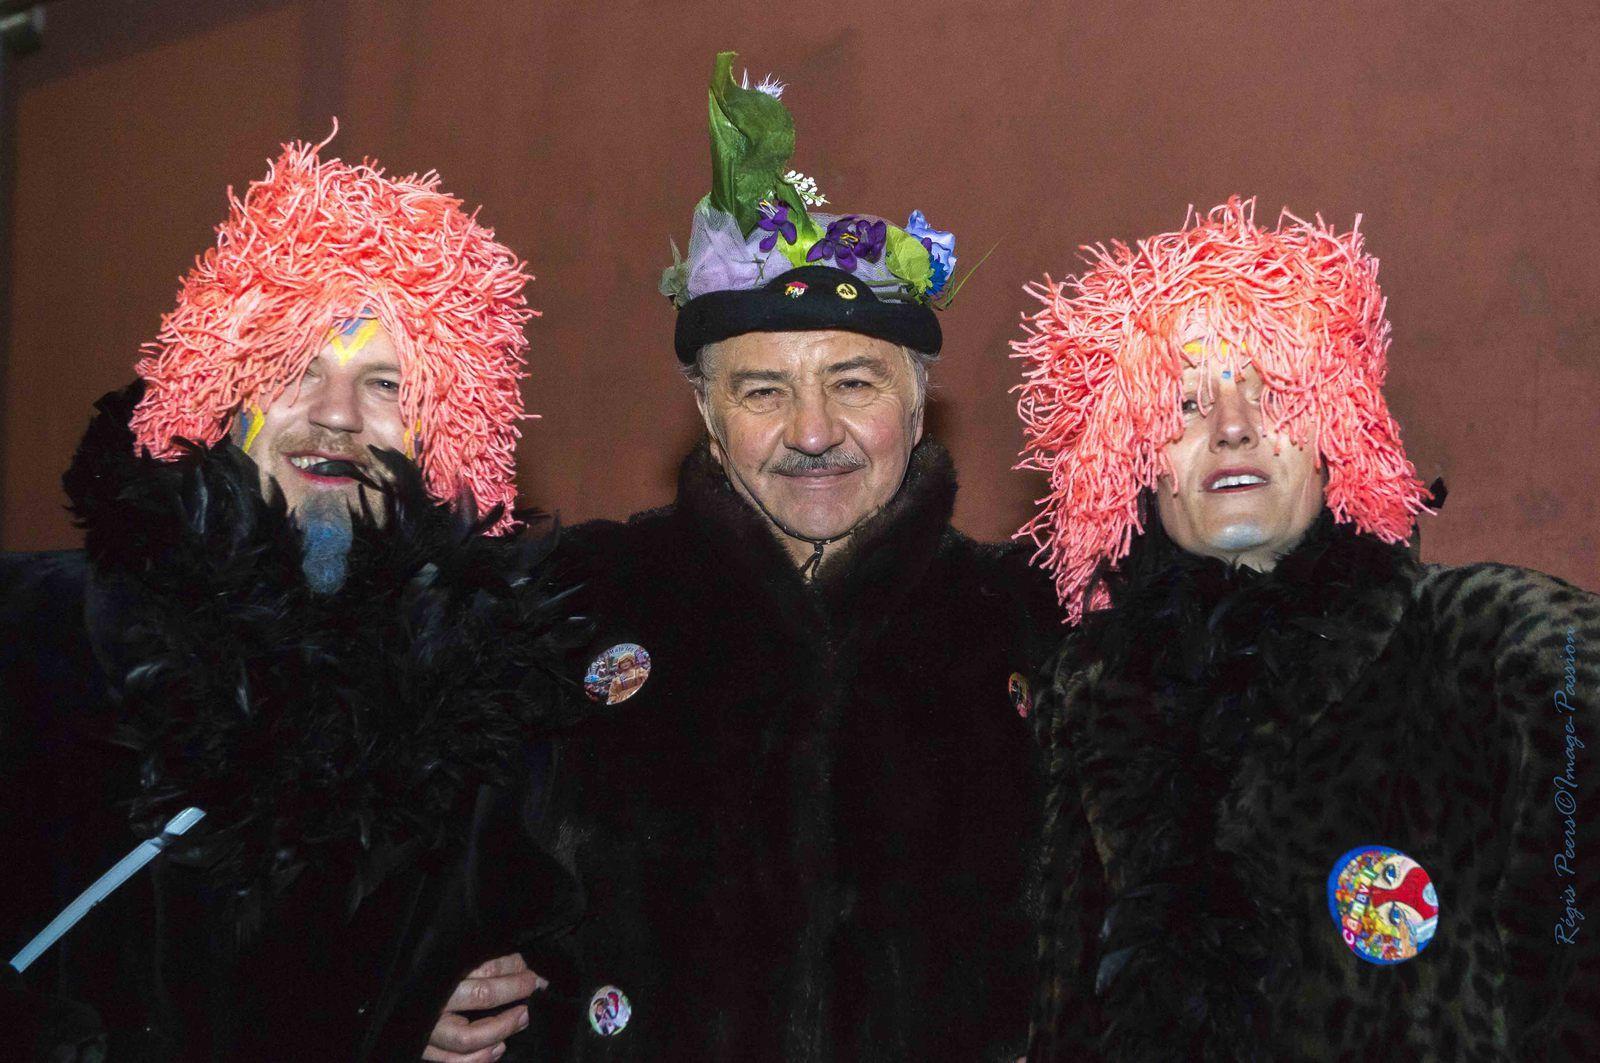 Bande de la Citadelle - Carnaval de Dunkerque 2016